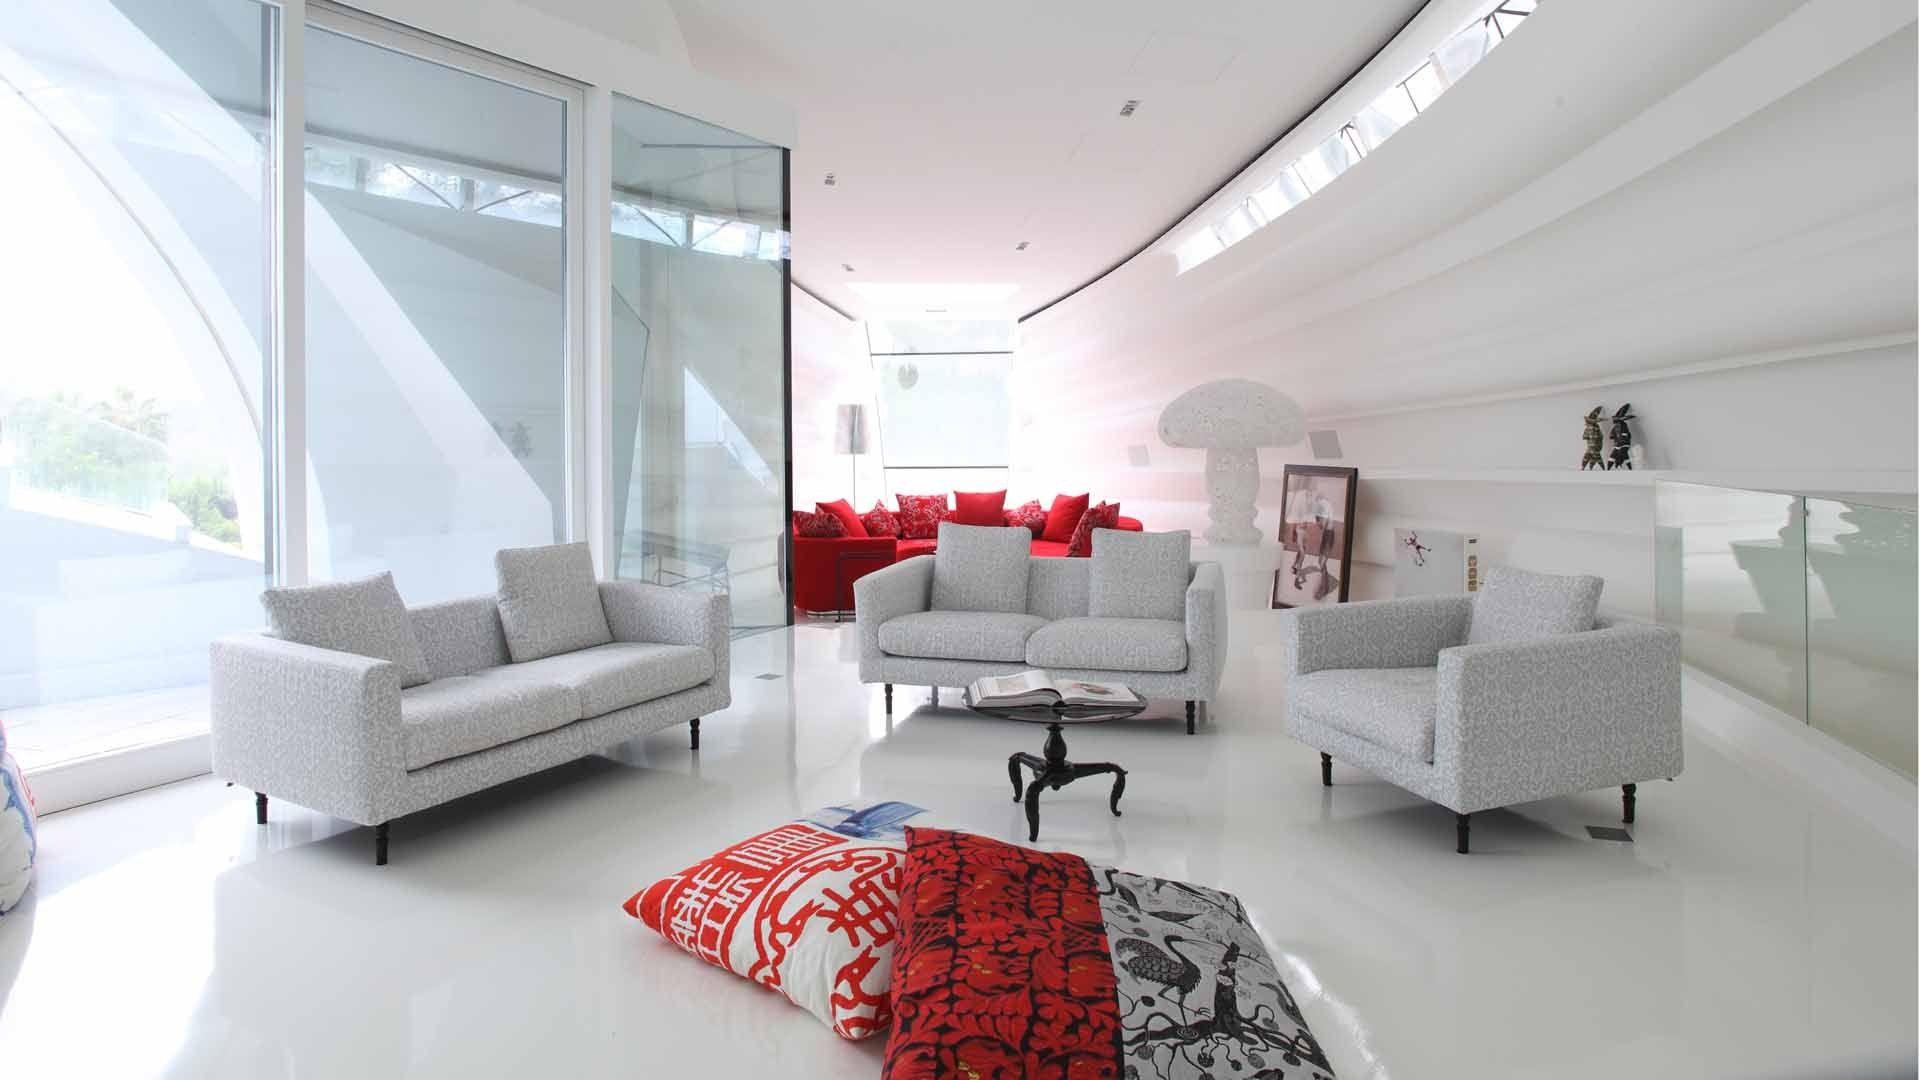 2013 futuristic cozy living room interior  modern white